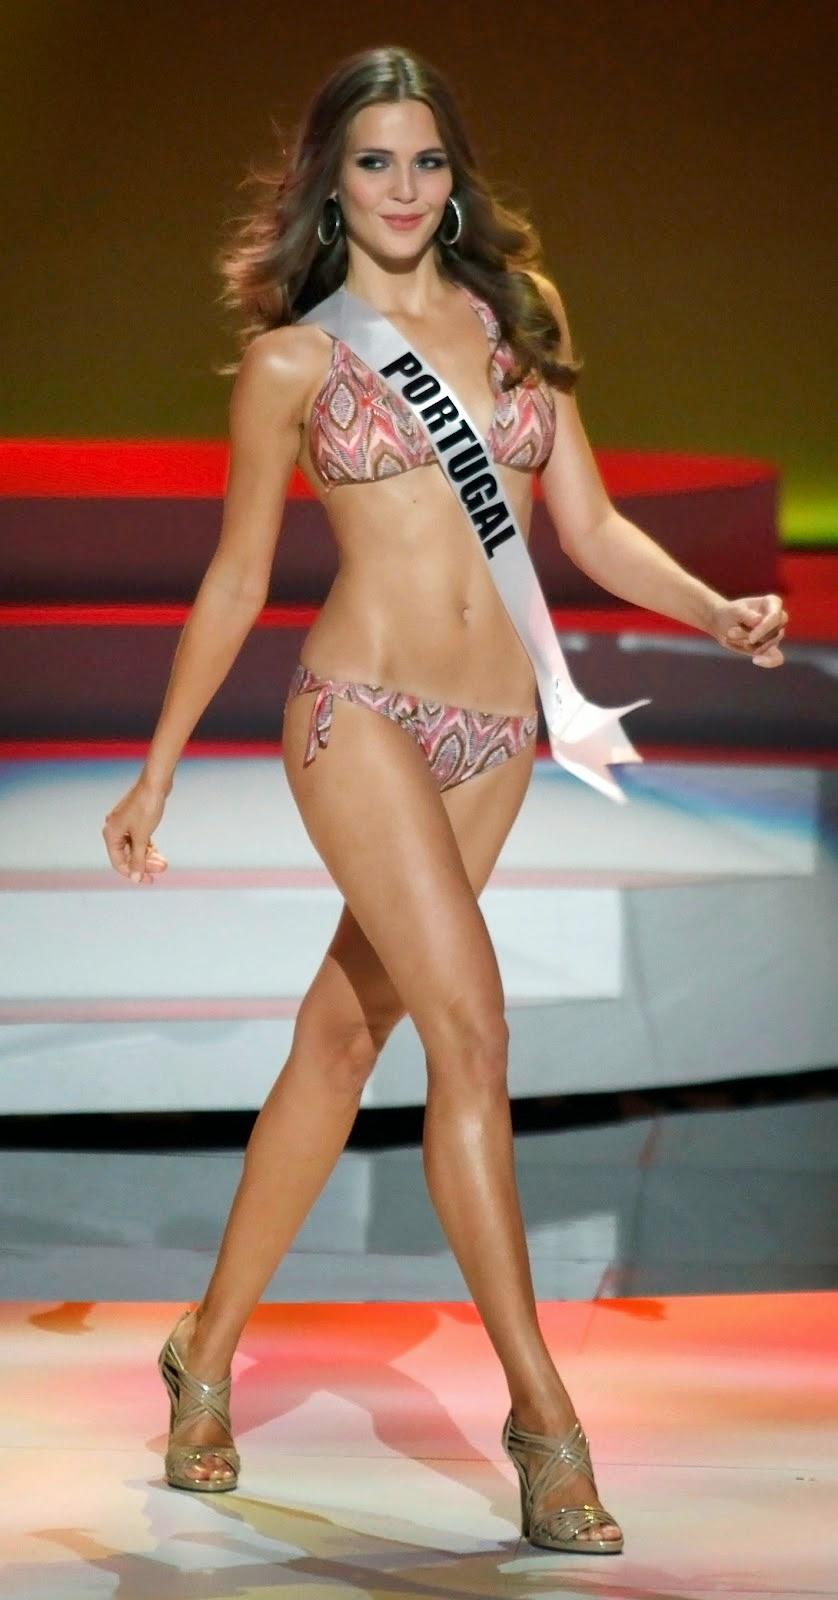 Yulia Alipova further Miss Universe 2015 furthermore Miss Patricia Da Silva Portugal besides Davalos  Miss Paraguay 2014 DARREN DECKER MISS UNIVERSE CORTESÍA besides Patricia Da Silva Crowned As Miss Universe Portugal 2014 Angelopedia. on patricia da silva miss universe portugal